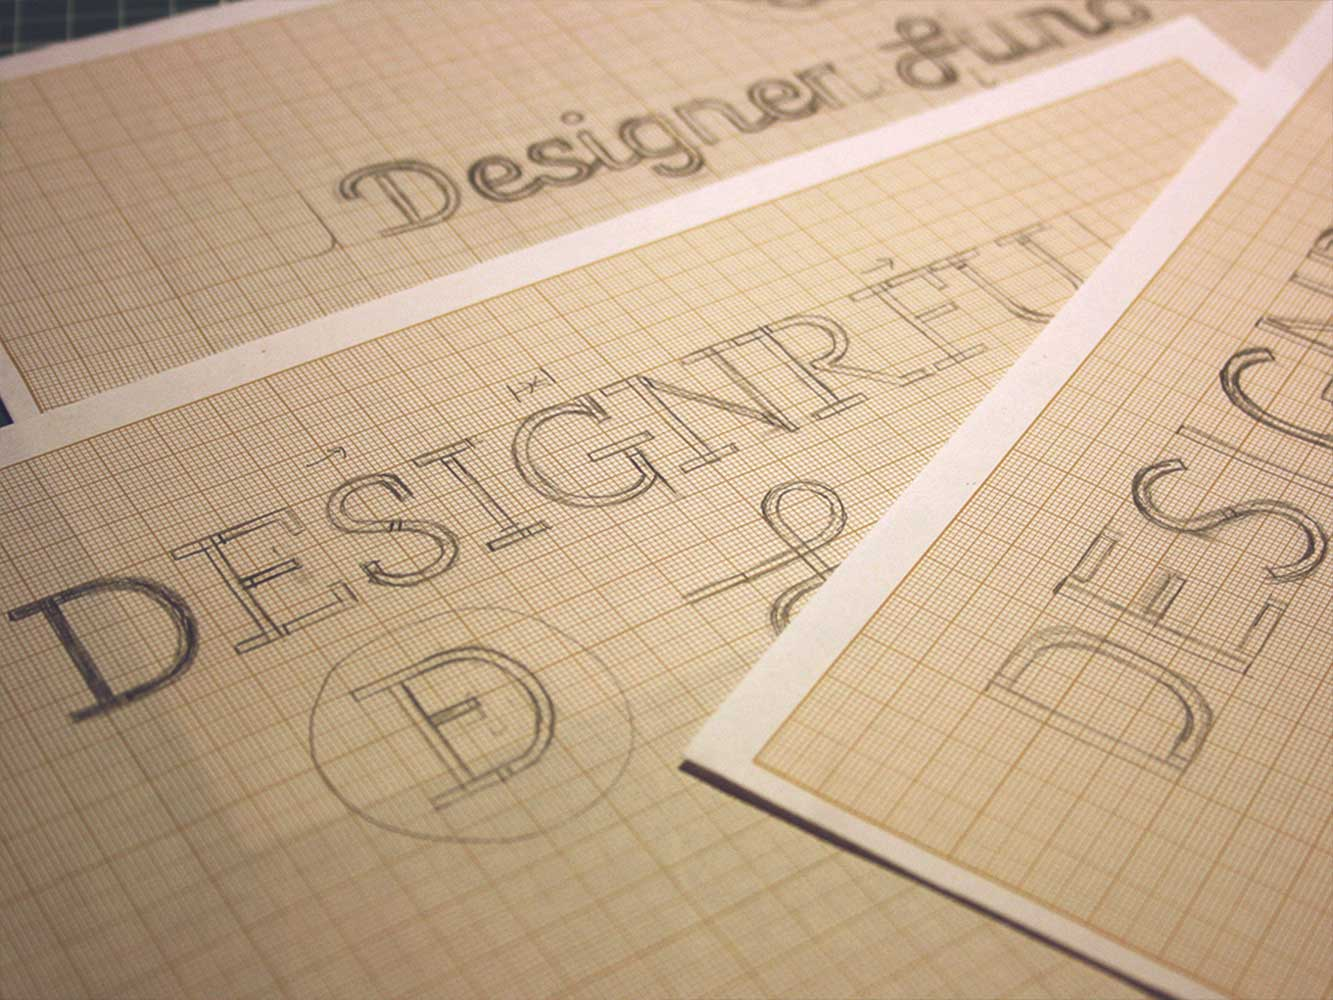 خدمات > طراحی گرافیک > طراحی لوگو و آرم   طراحی غرفه نمایشگاهیطراحی لوگو و آرم